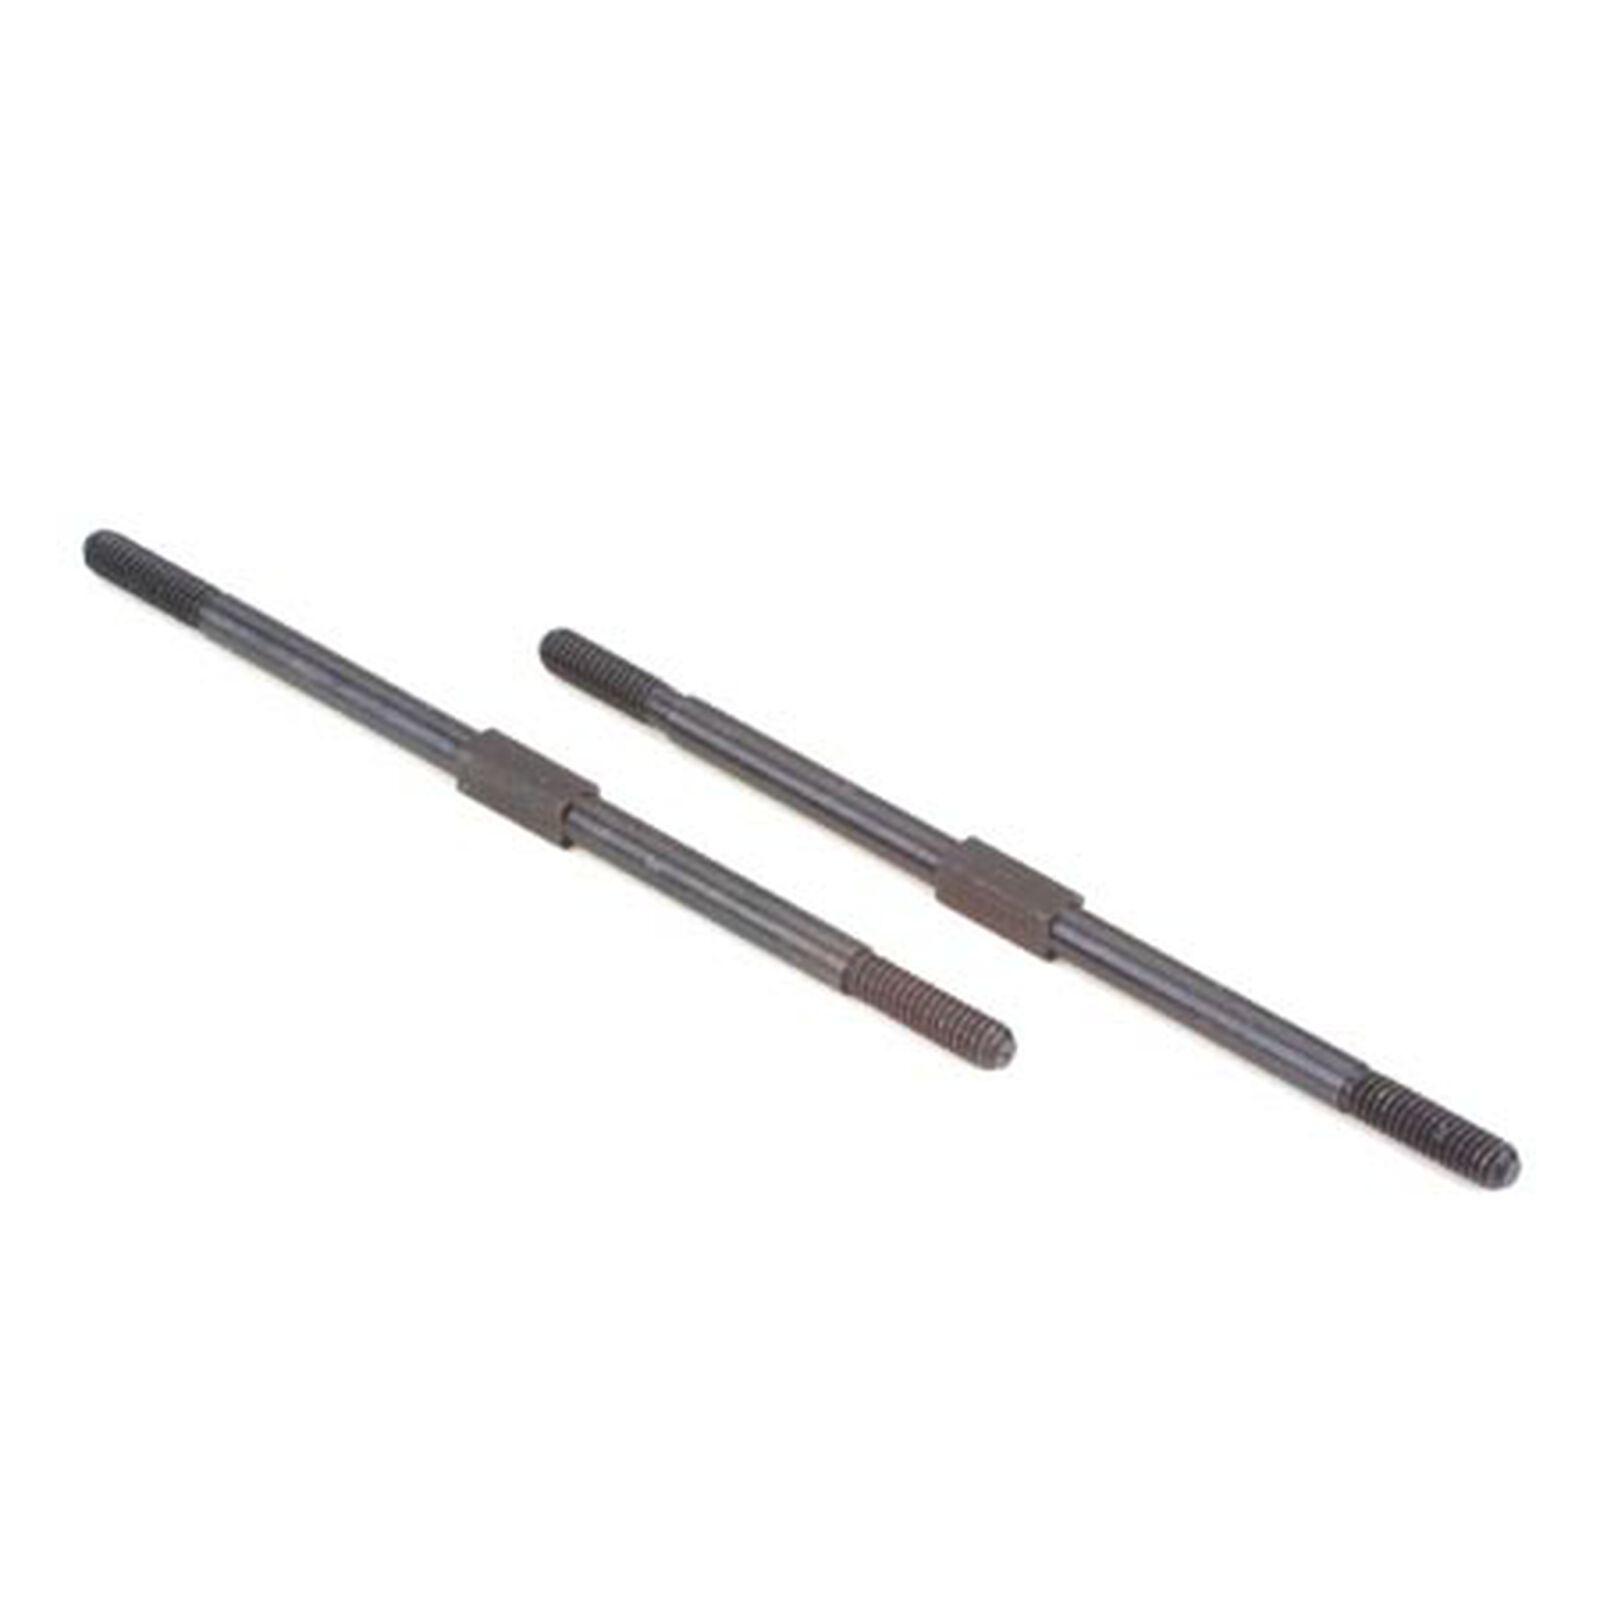 "Turnbuckle 2.62"", Steel (2): RC10T/GT/T2/T3/T4"